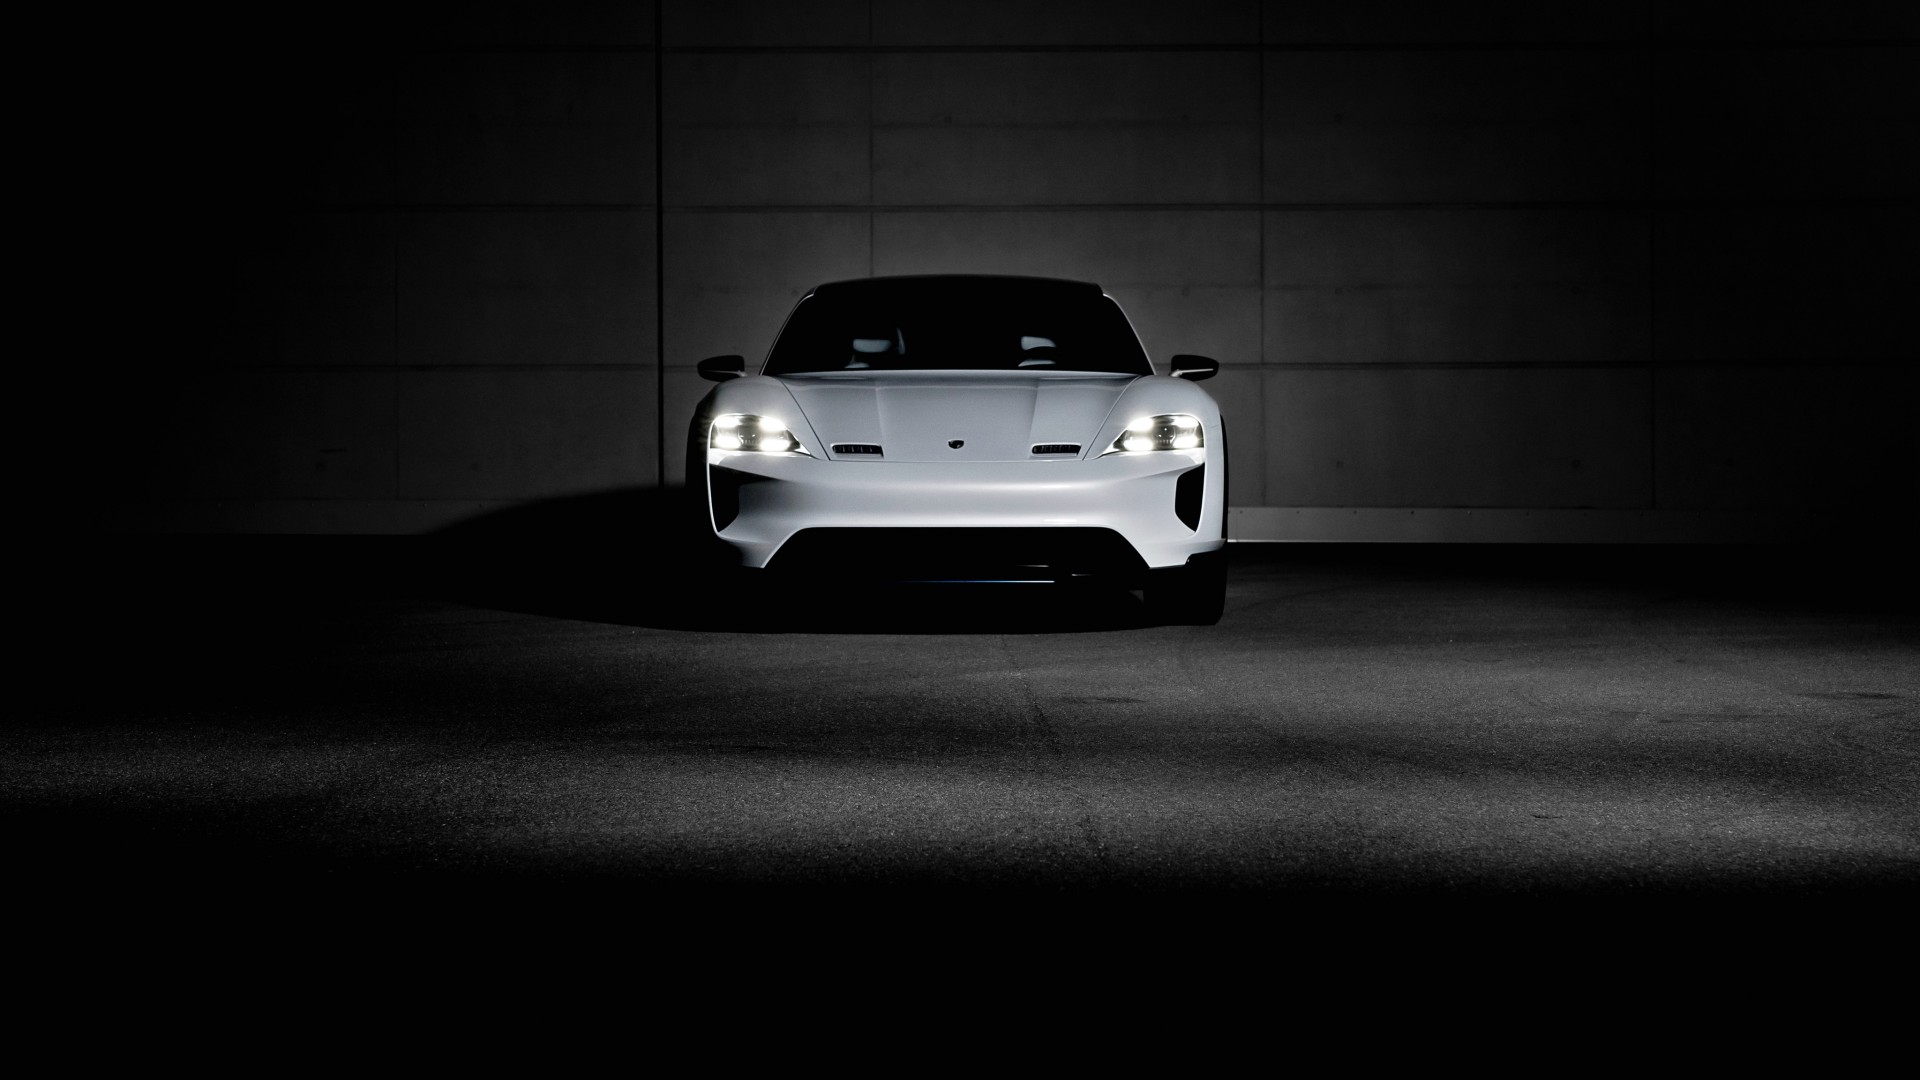 Car Wheel Iphone Wallpaper 2018 Porsche Mission E Cross Turismo 4k 15 Wallpaper Hd